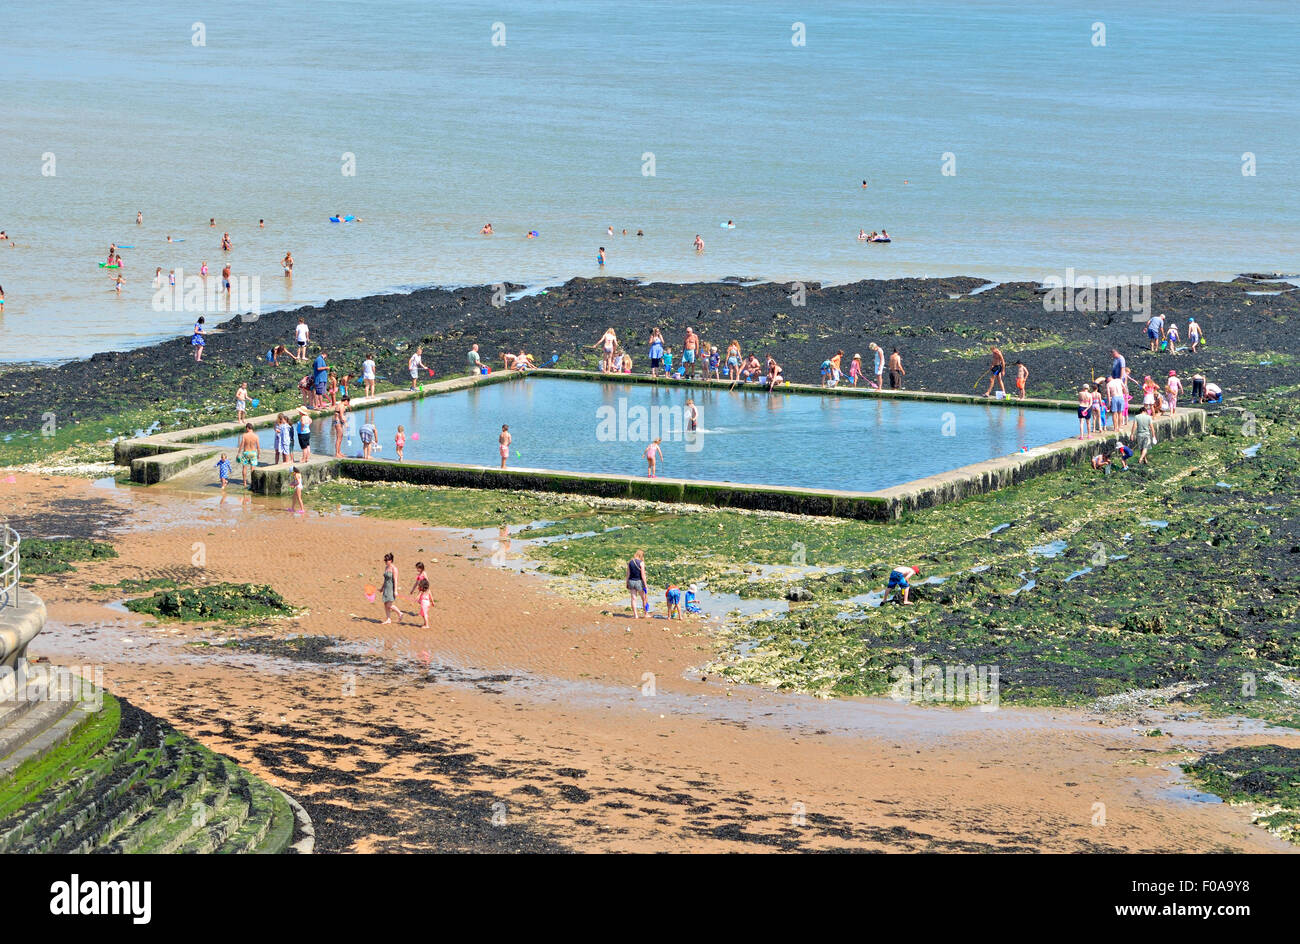 Man Made Sea Pools By Beach